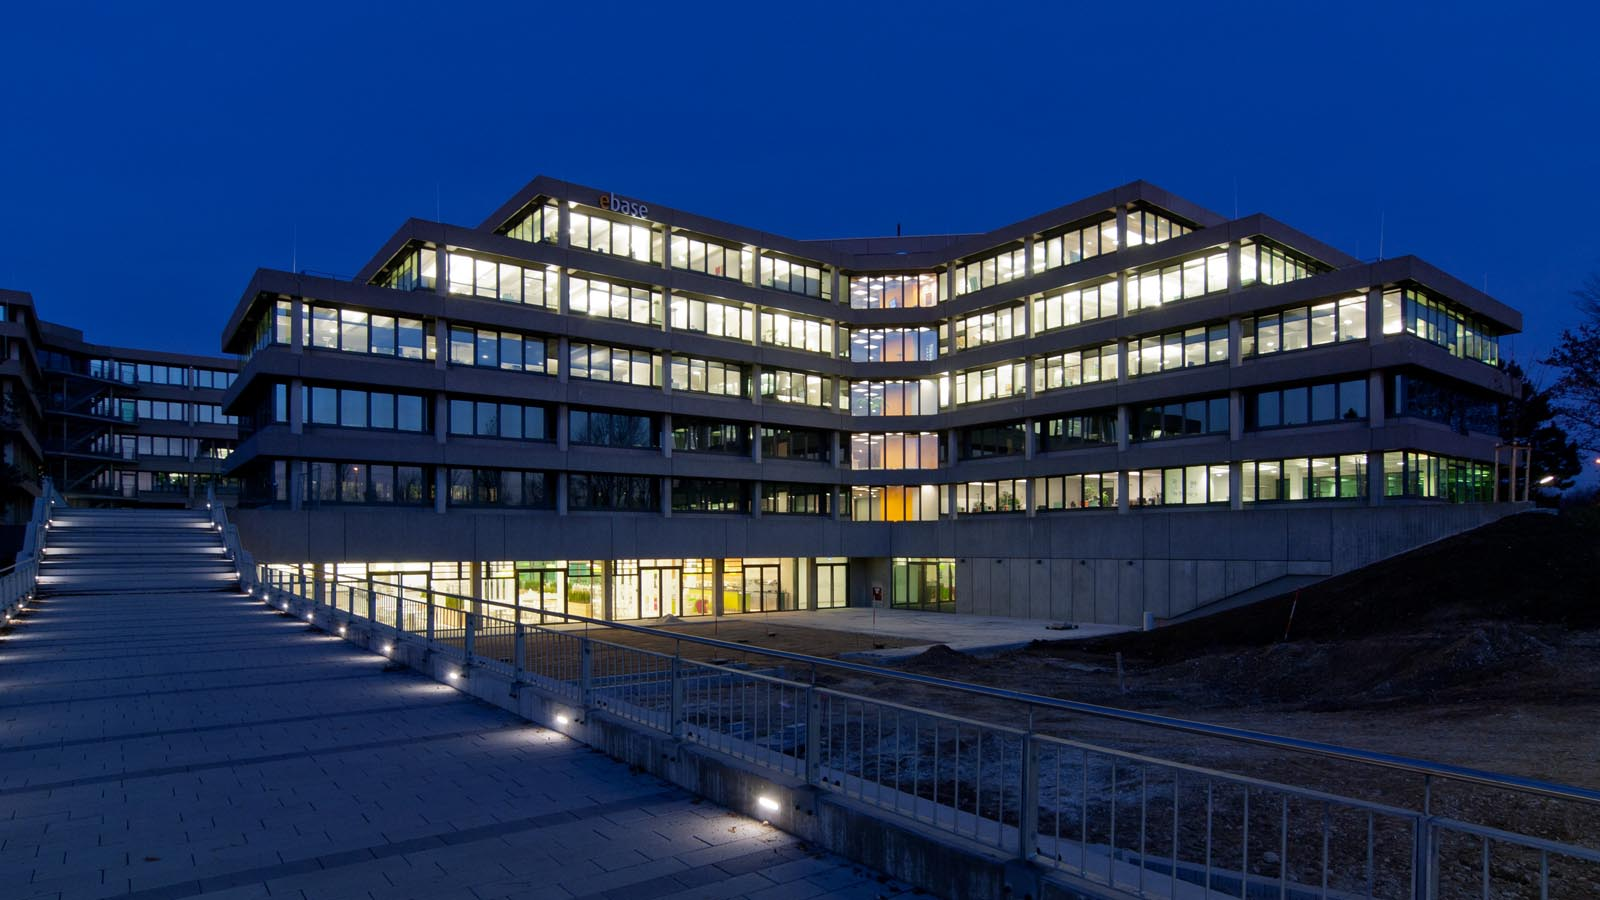 Concor Bürogebäude Aufn. Nov 2011, München Dormnach